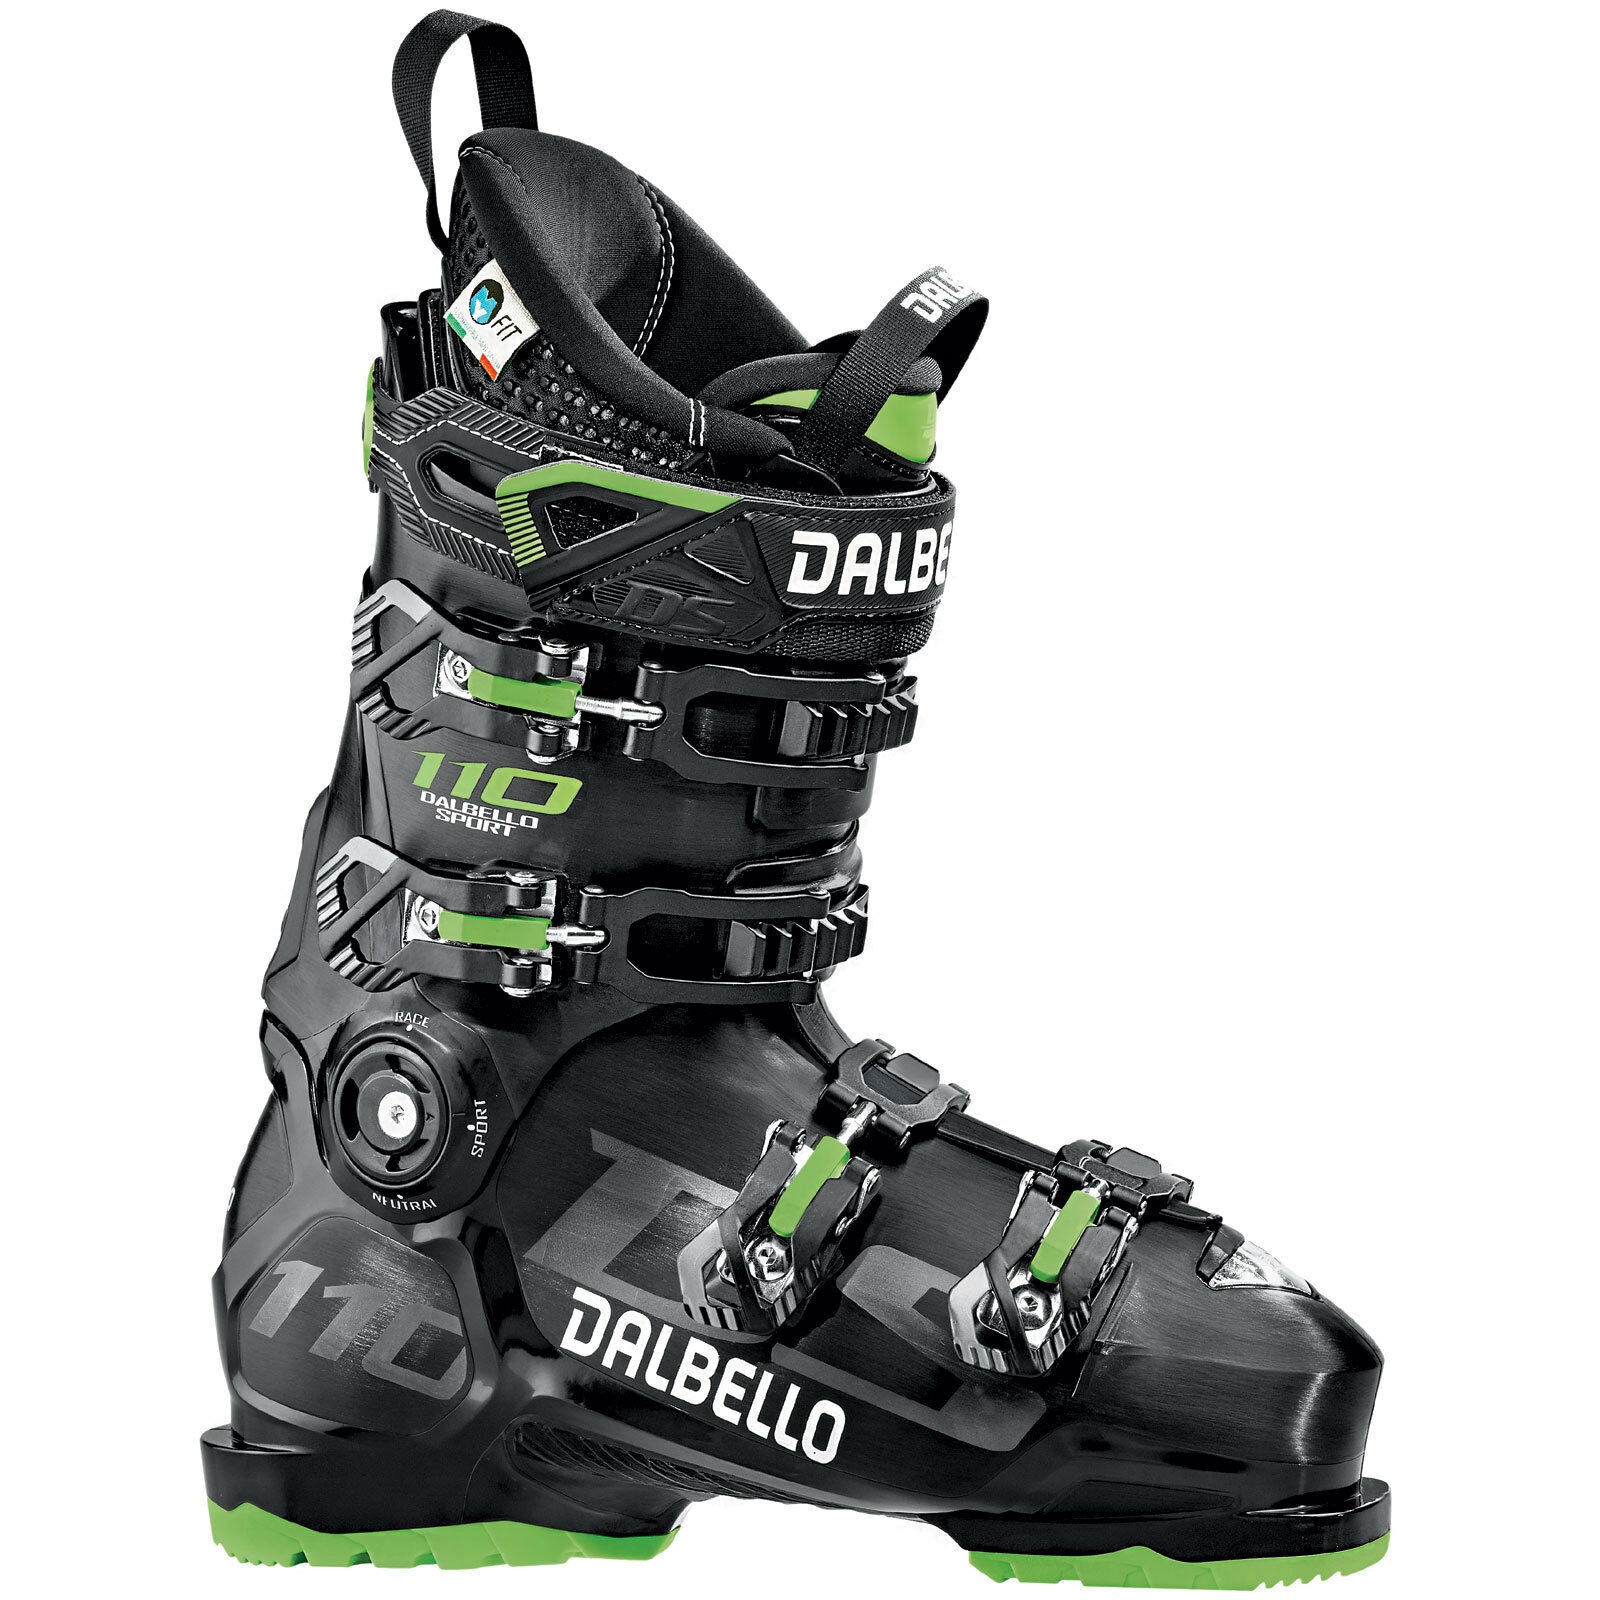 Dalbello DS 110 MS Herren-Skistiefel Ski Schuhe Stiefel Stiefel Skischuhe Schuhe Ski Alpin 0ffa91